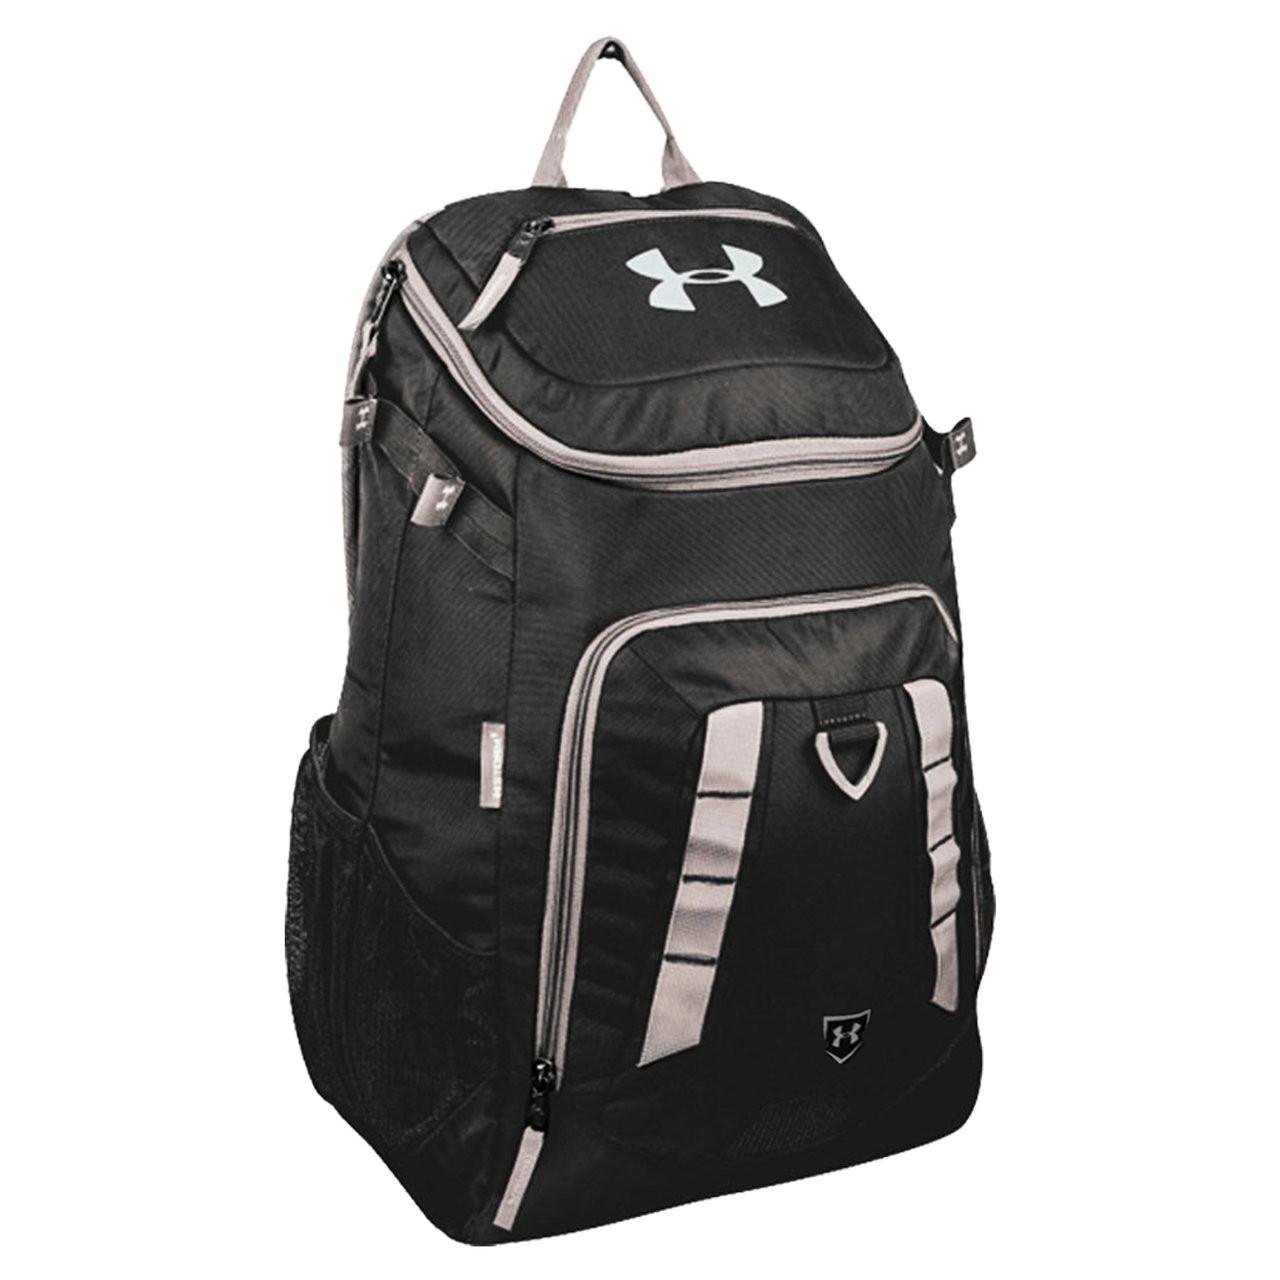 0b2aeaf46e Under Armour Undeniable Baseball   Softball Bat Backpack ...